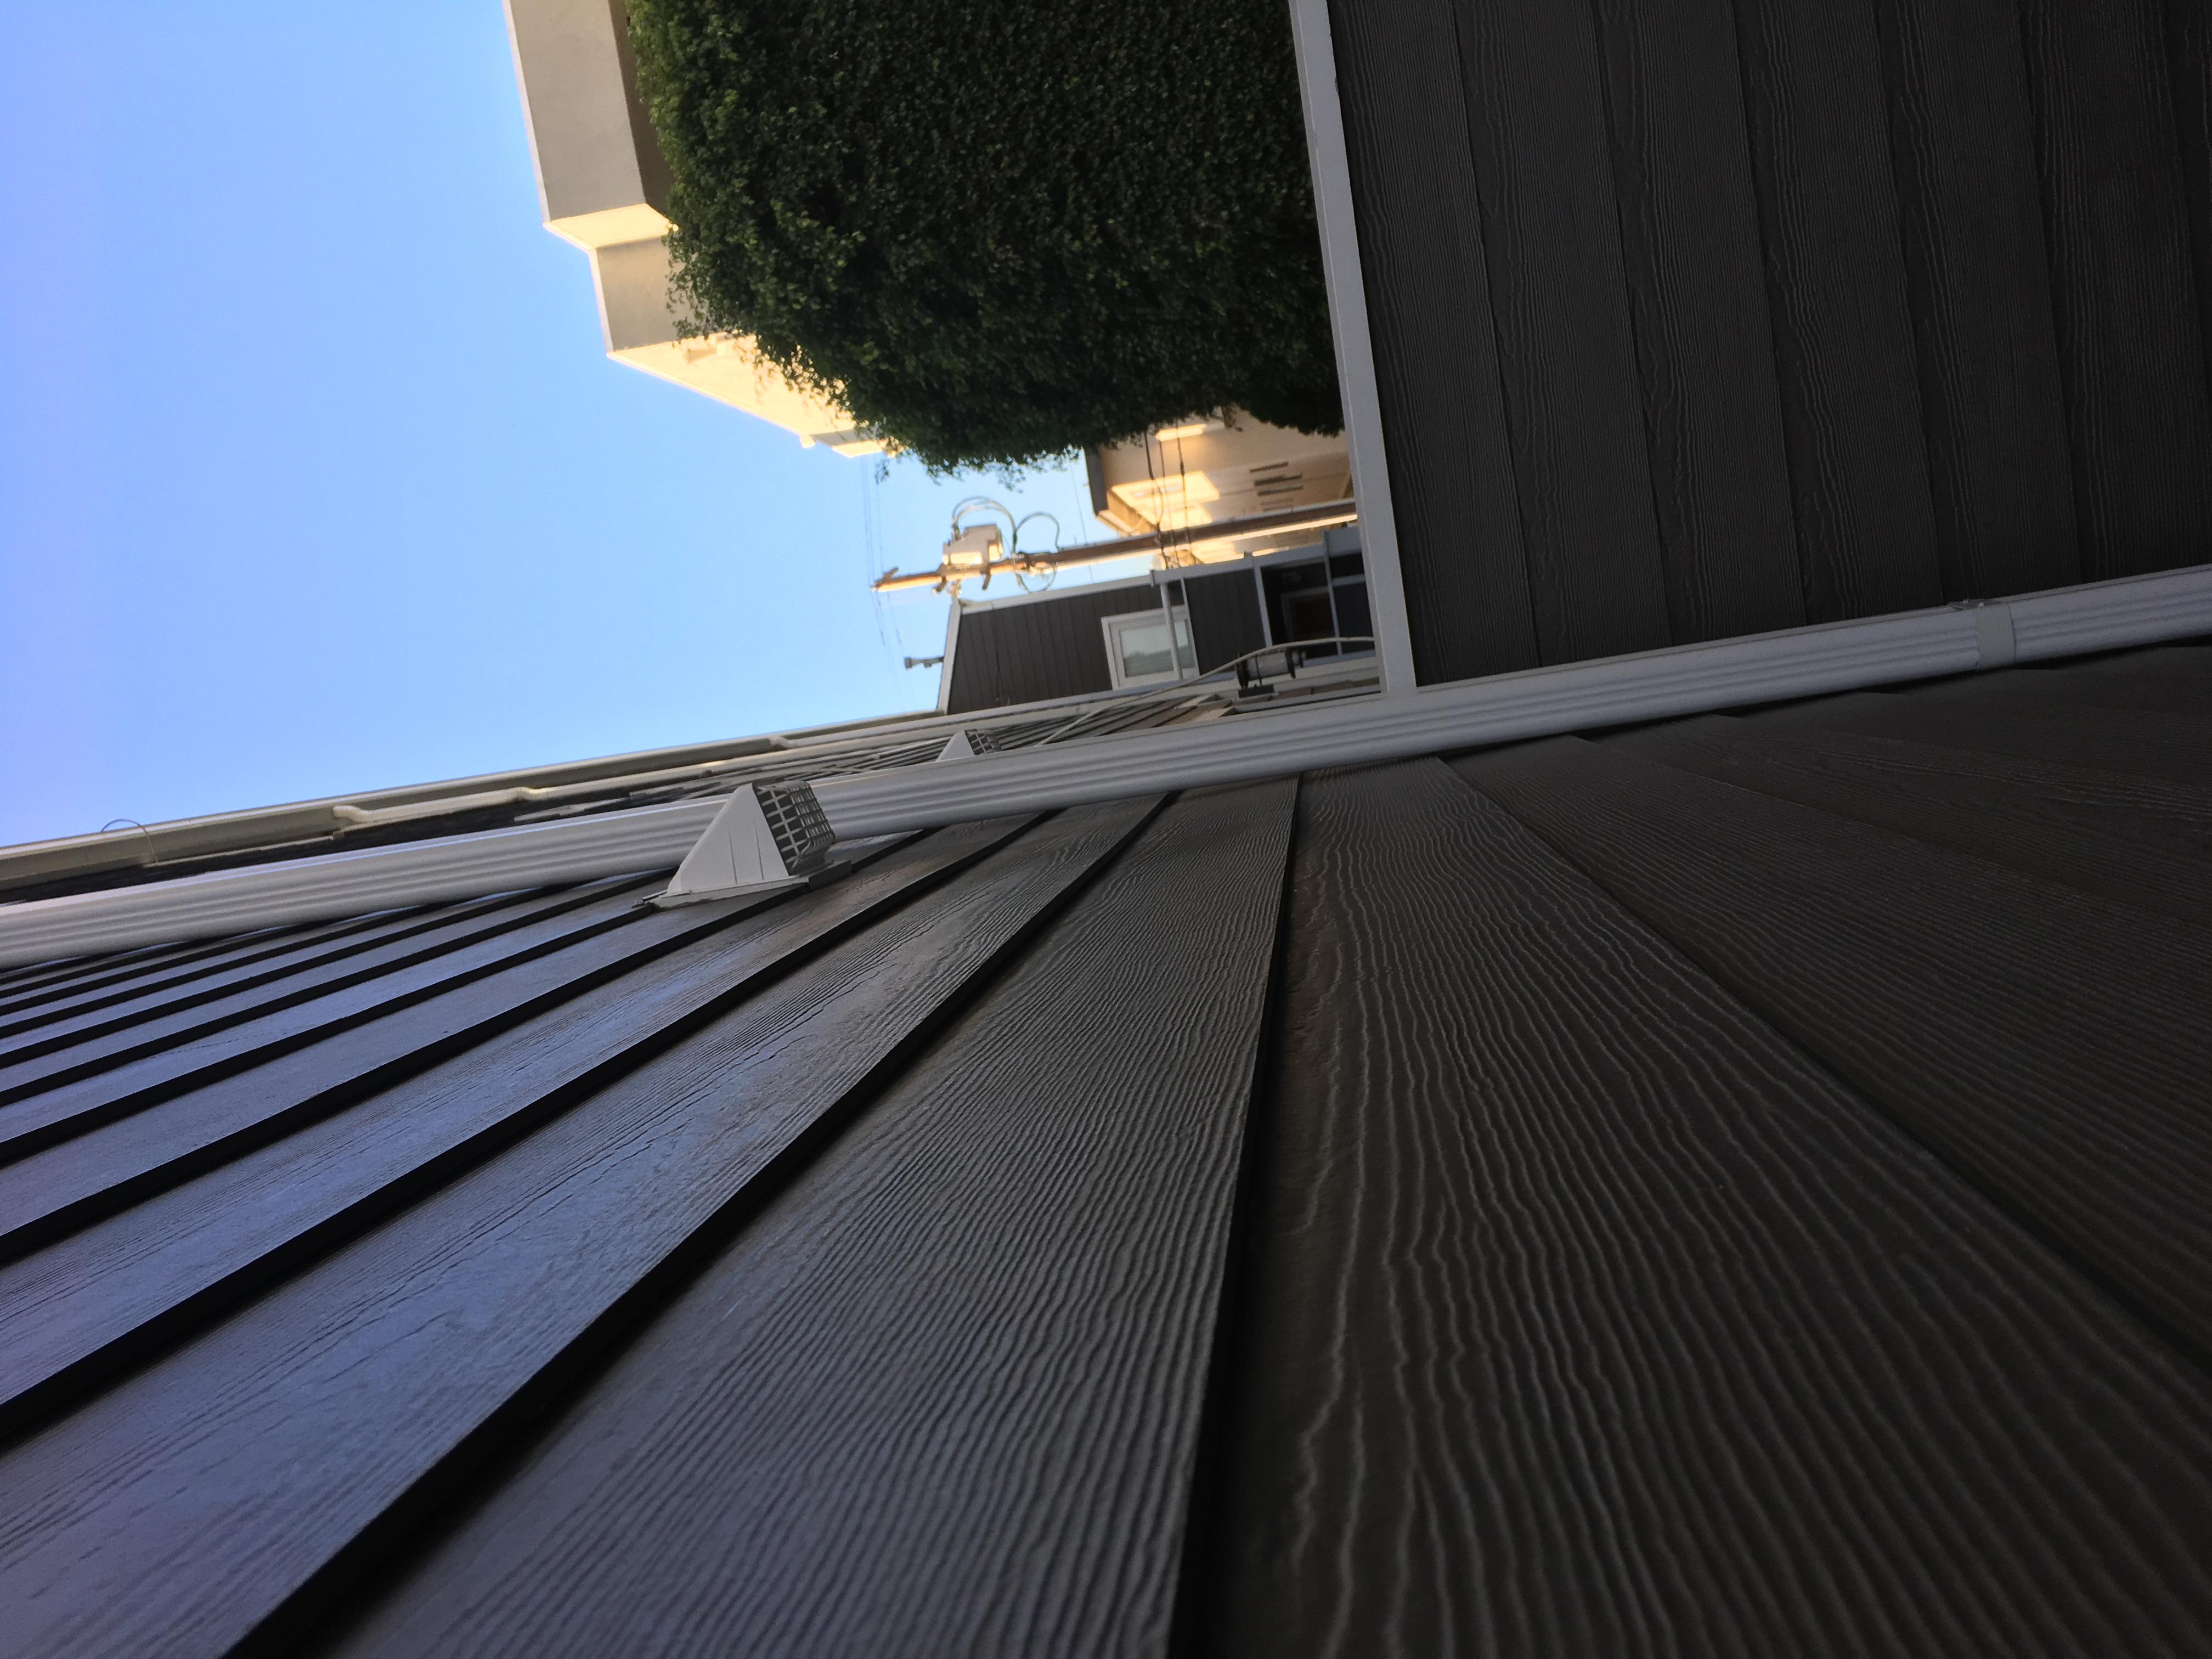 Running an exhaust duct in existing condo inbetween floors - help?-img-6594.jpg